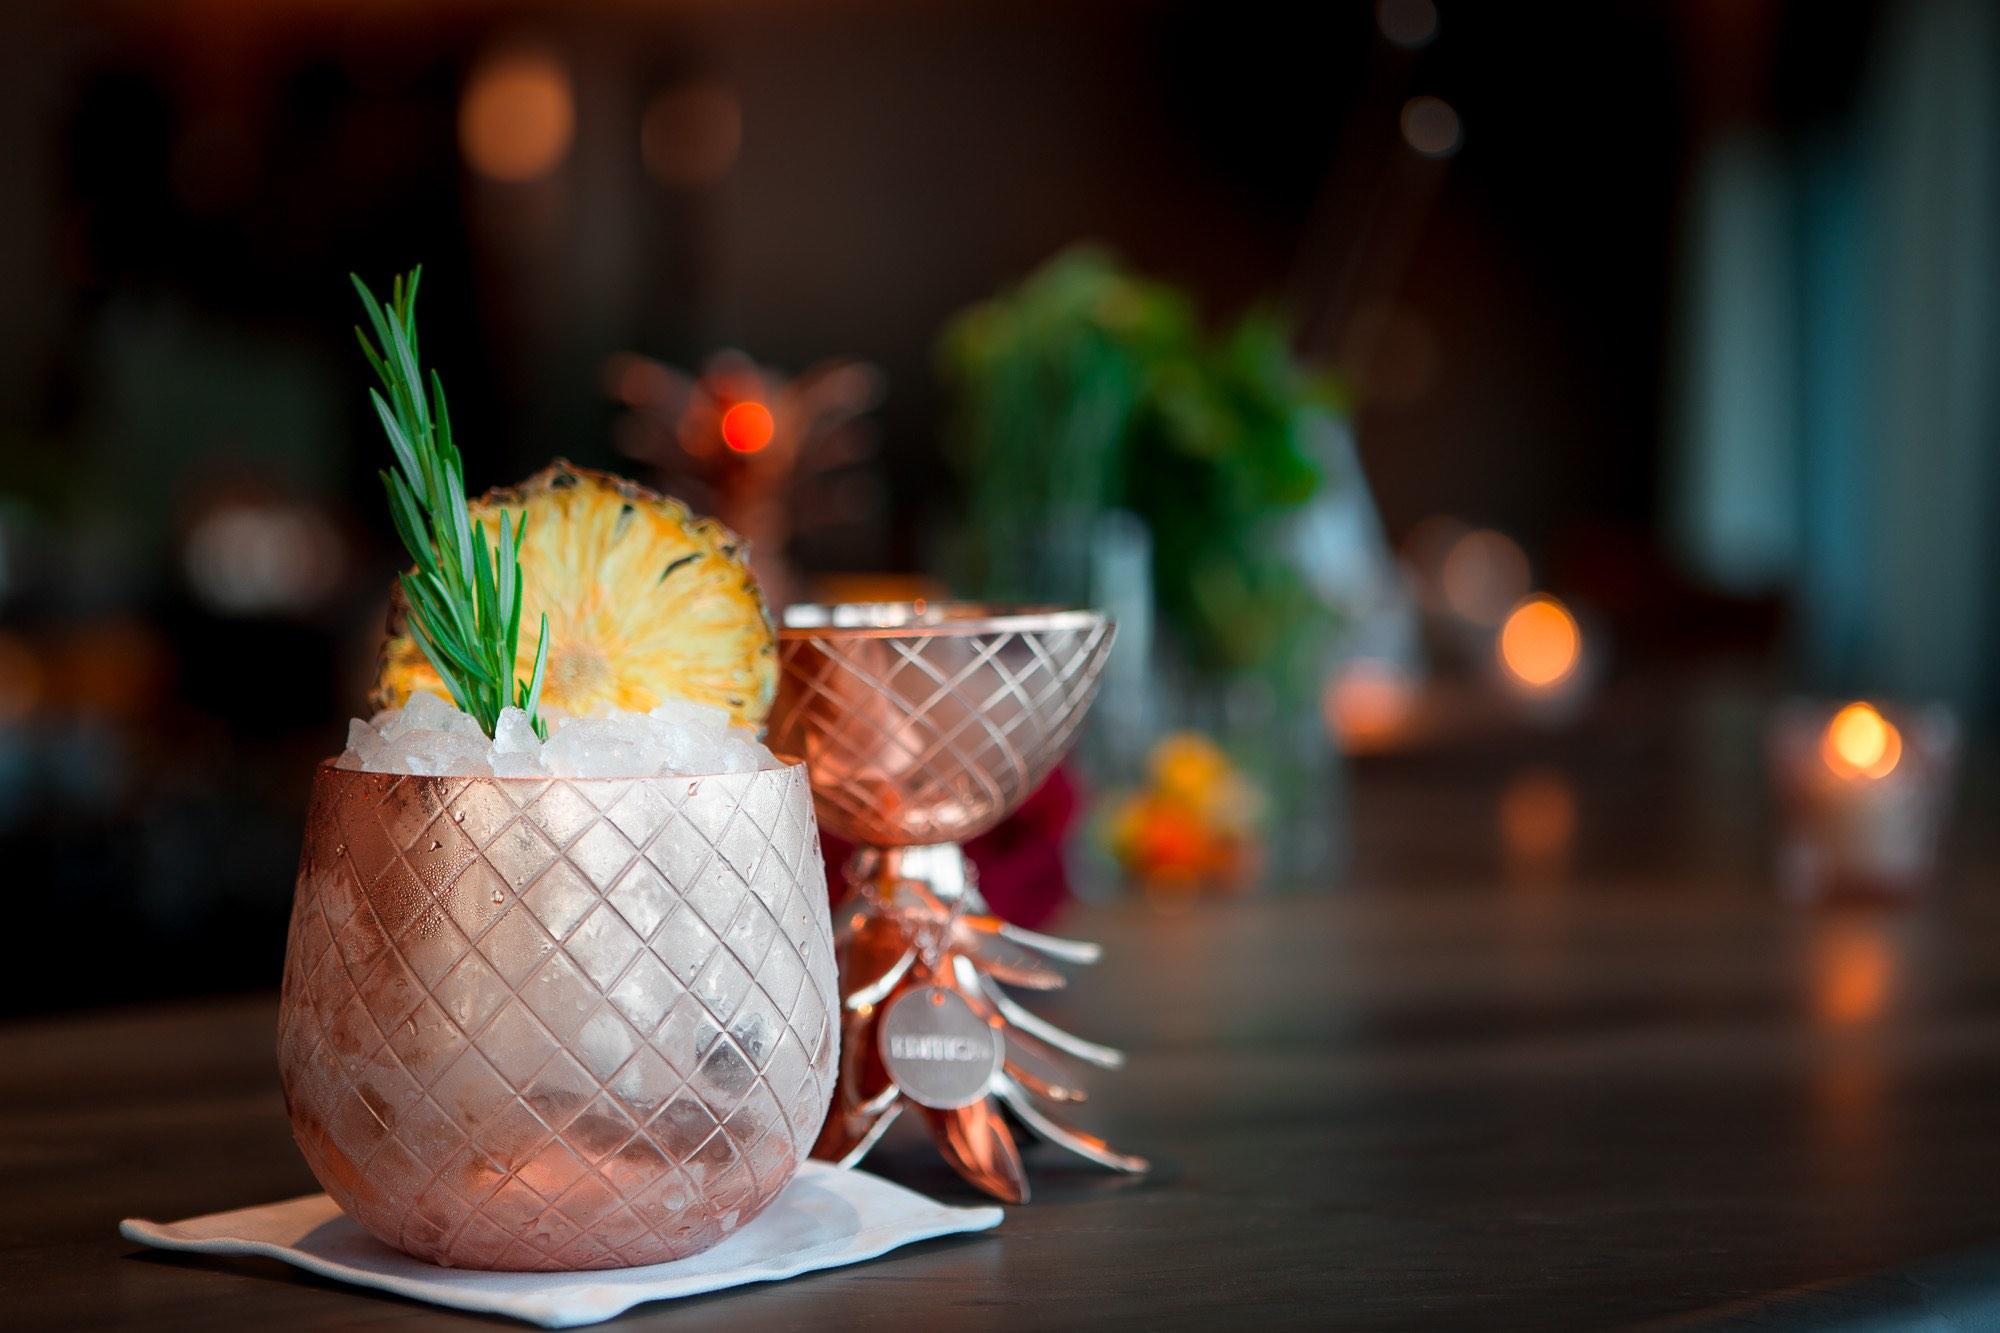 The Pineapple Matador Room